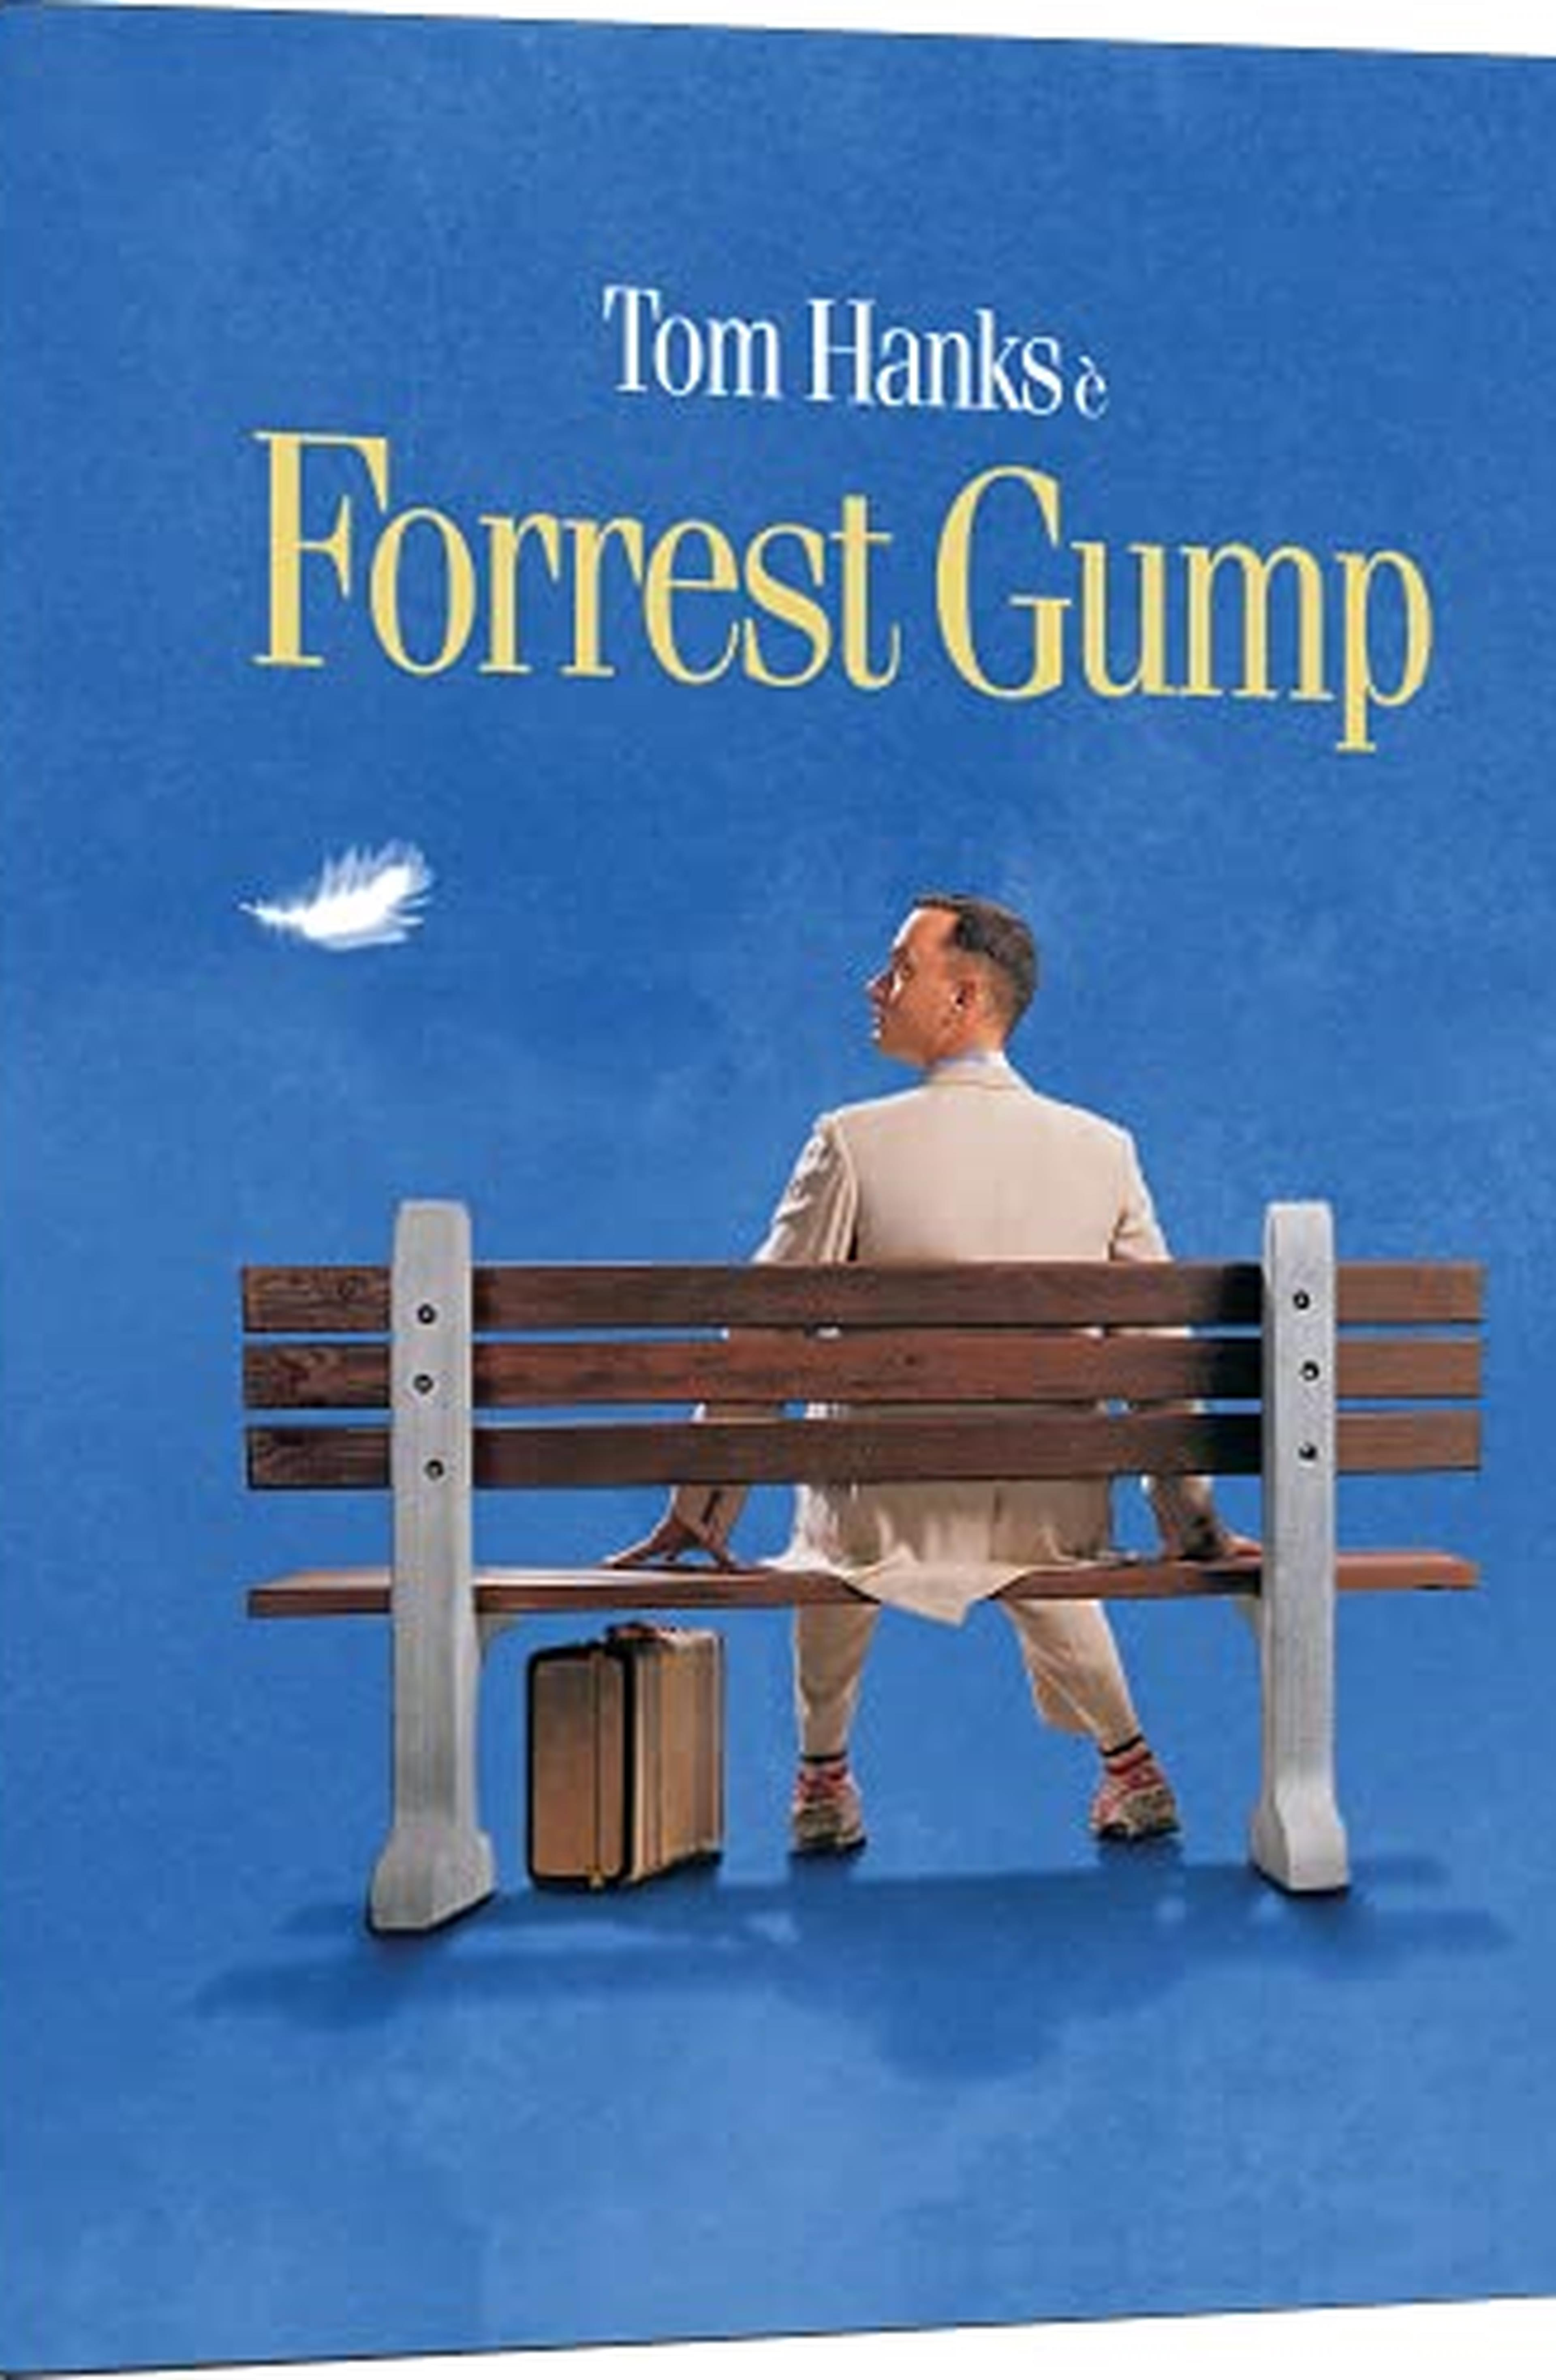 Forrest Gump (Steelbook 4K UHD + 2 Blu-Ray) (Limited Edition) (3 Blu Ray)